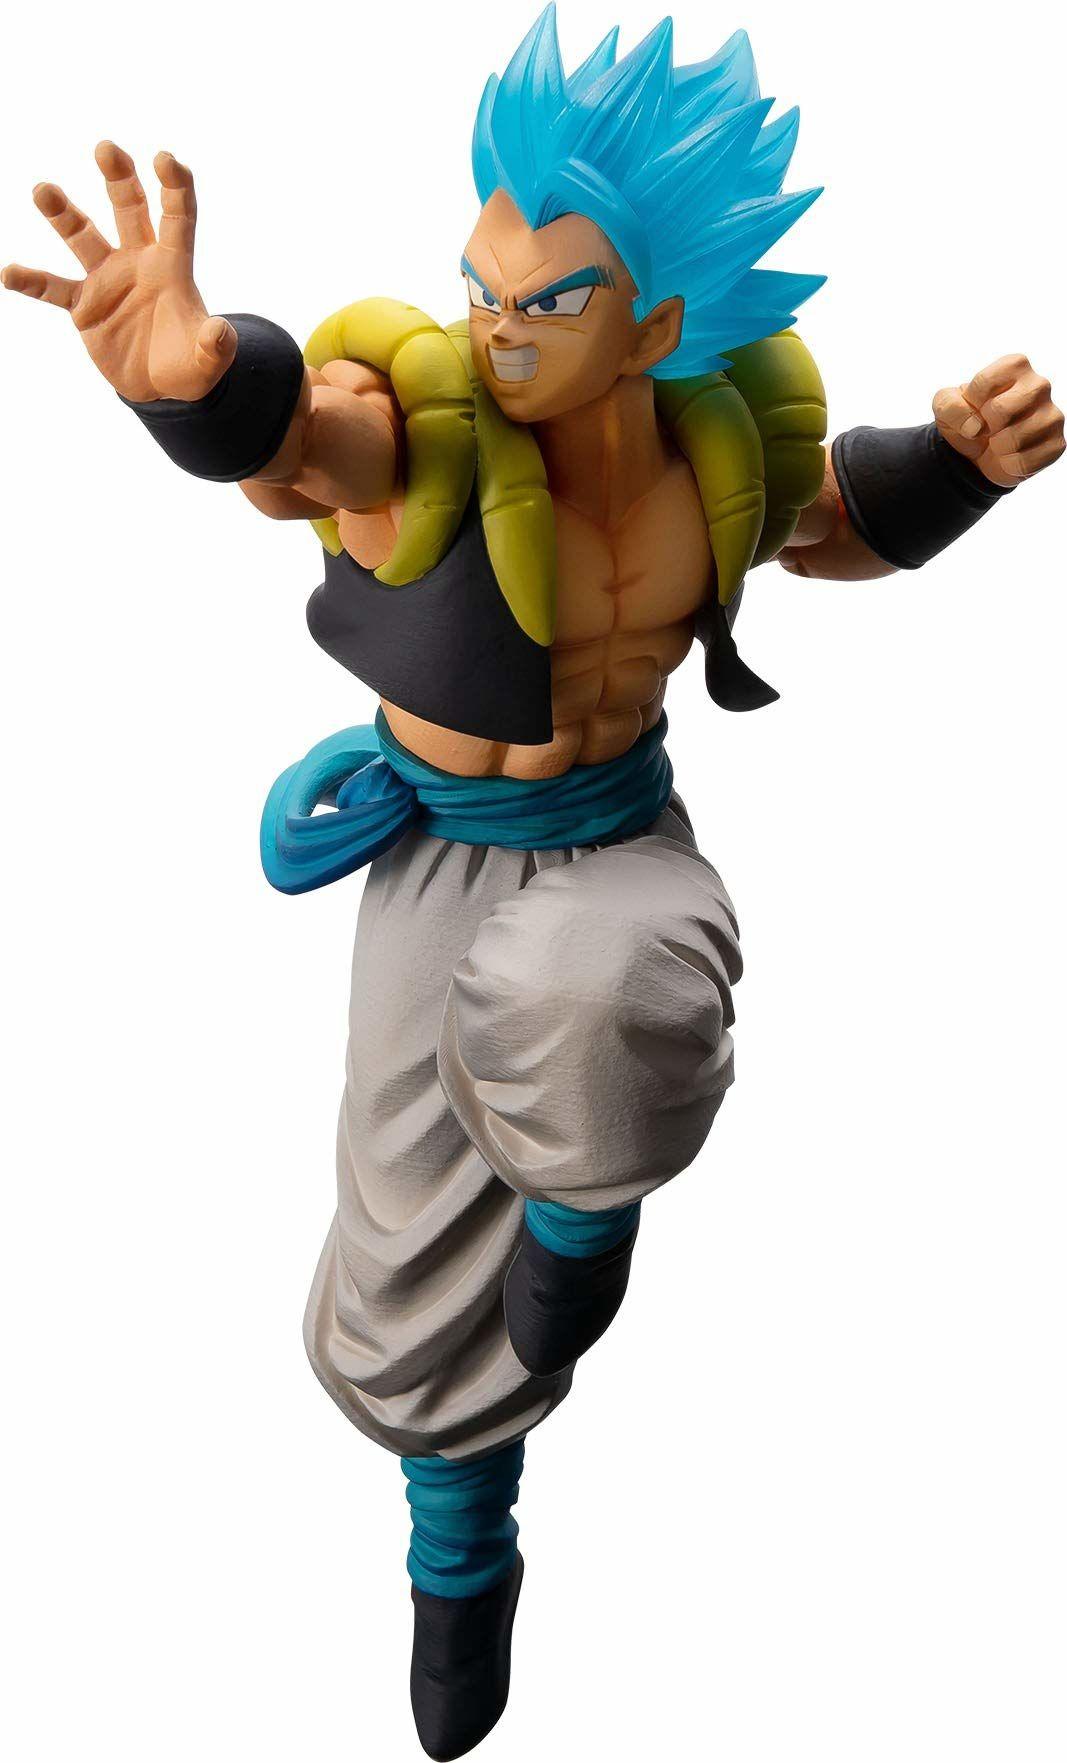 Dragon Ball Ichibansho PVC Statue Super Saiyajin God Super Saiyajin Gogeta 16 cm